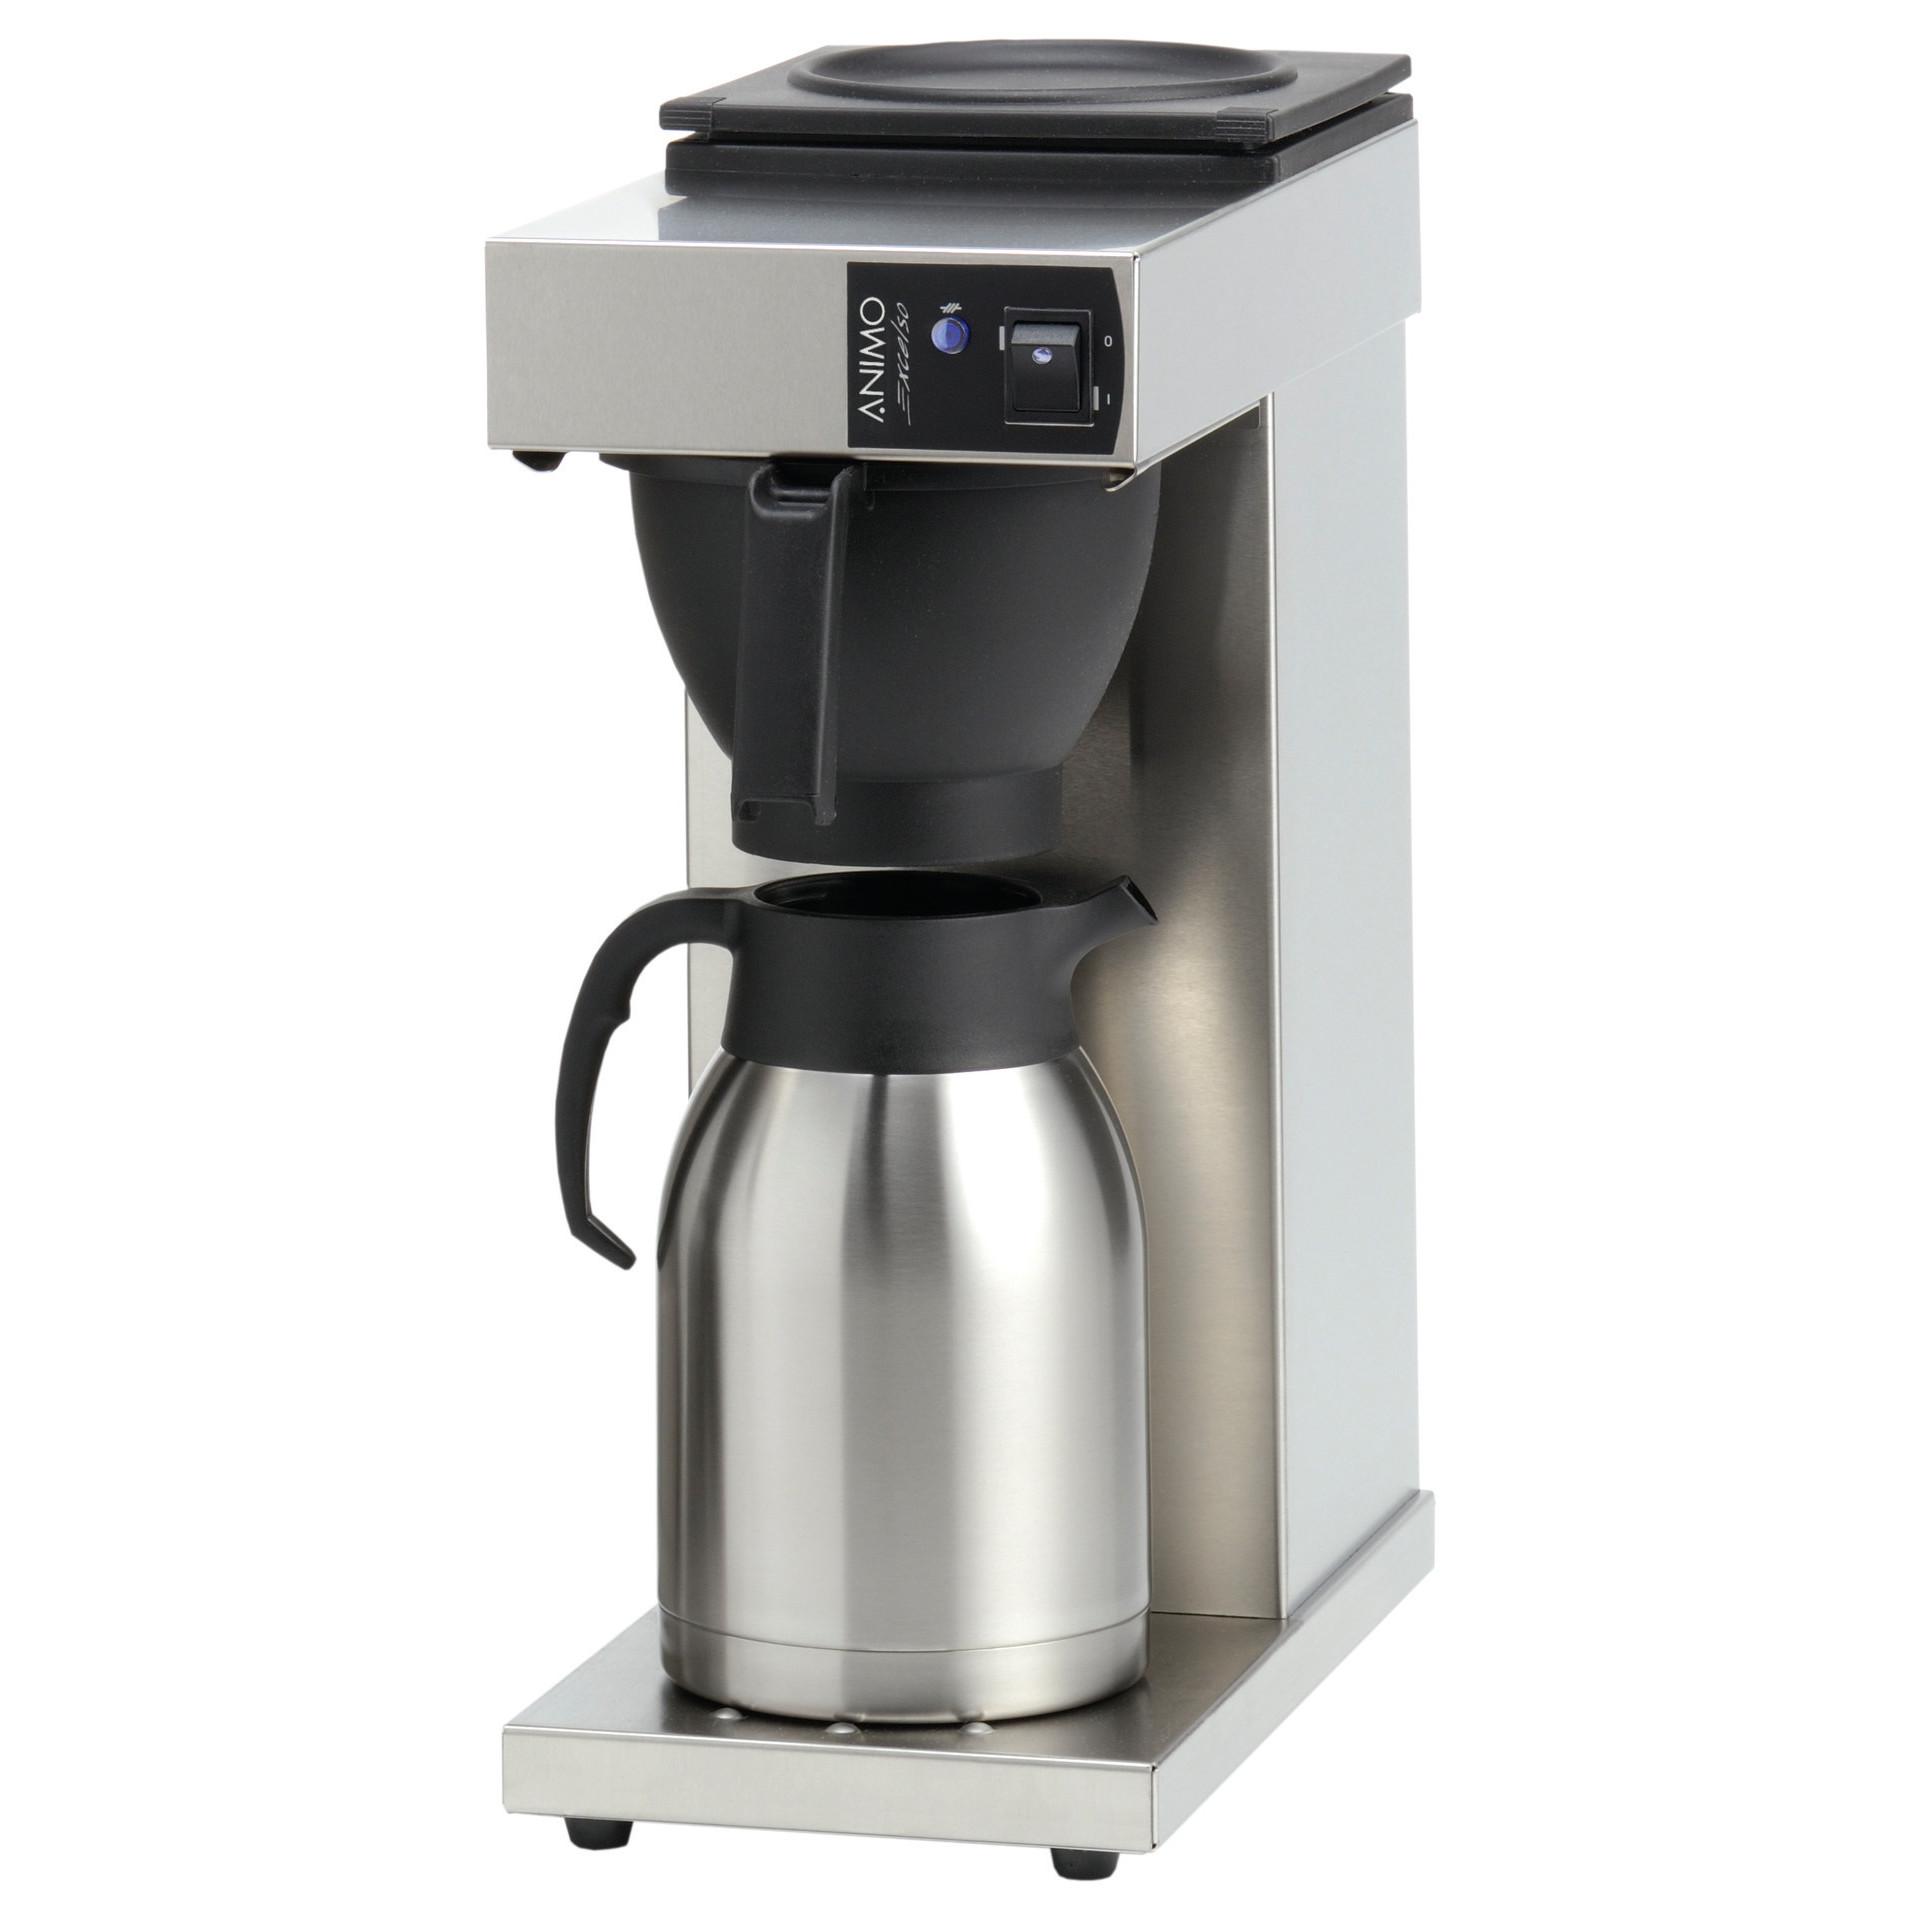 filterkaffeemaschine 2 00 l mit 1 thermoskanne ohne. Black Bedroom Furniture Sets. Home Design Ideas